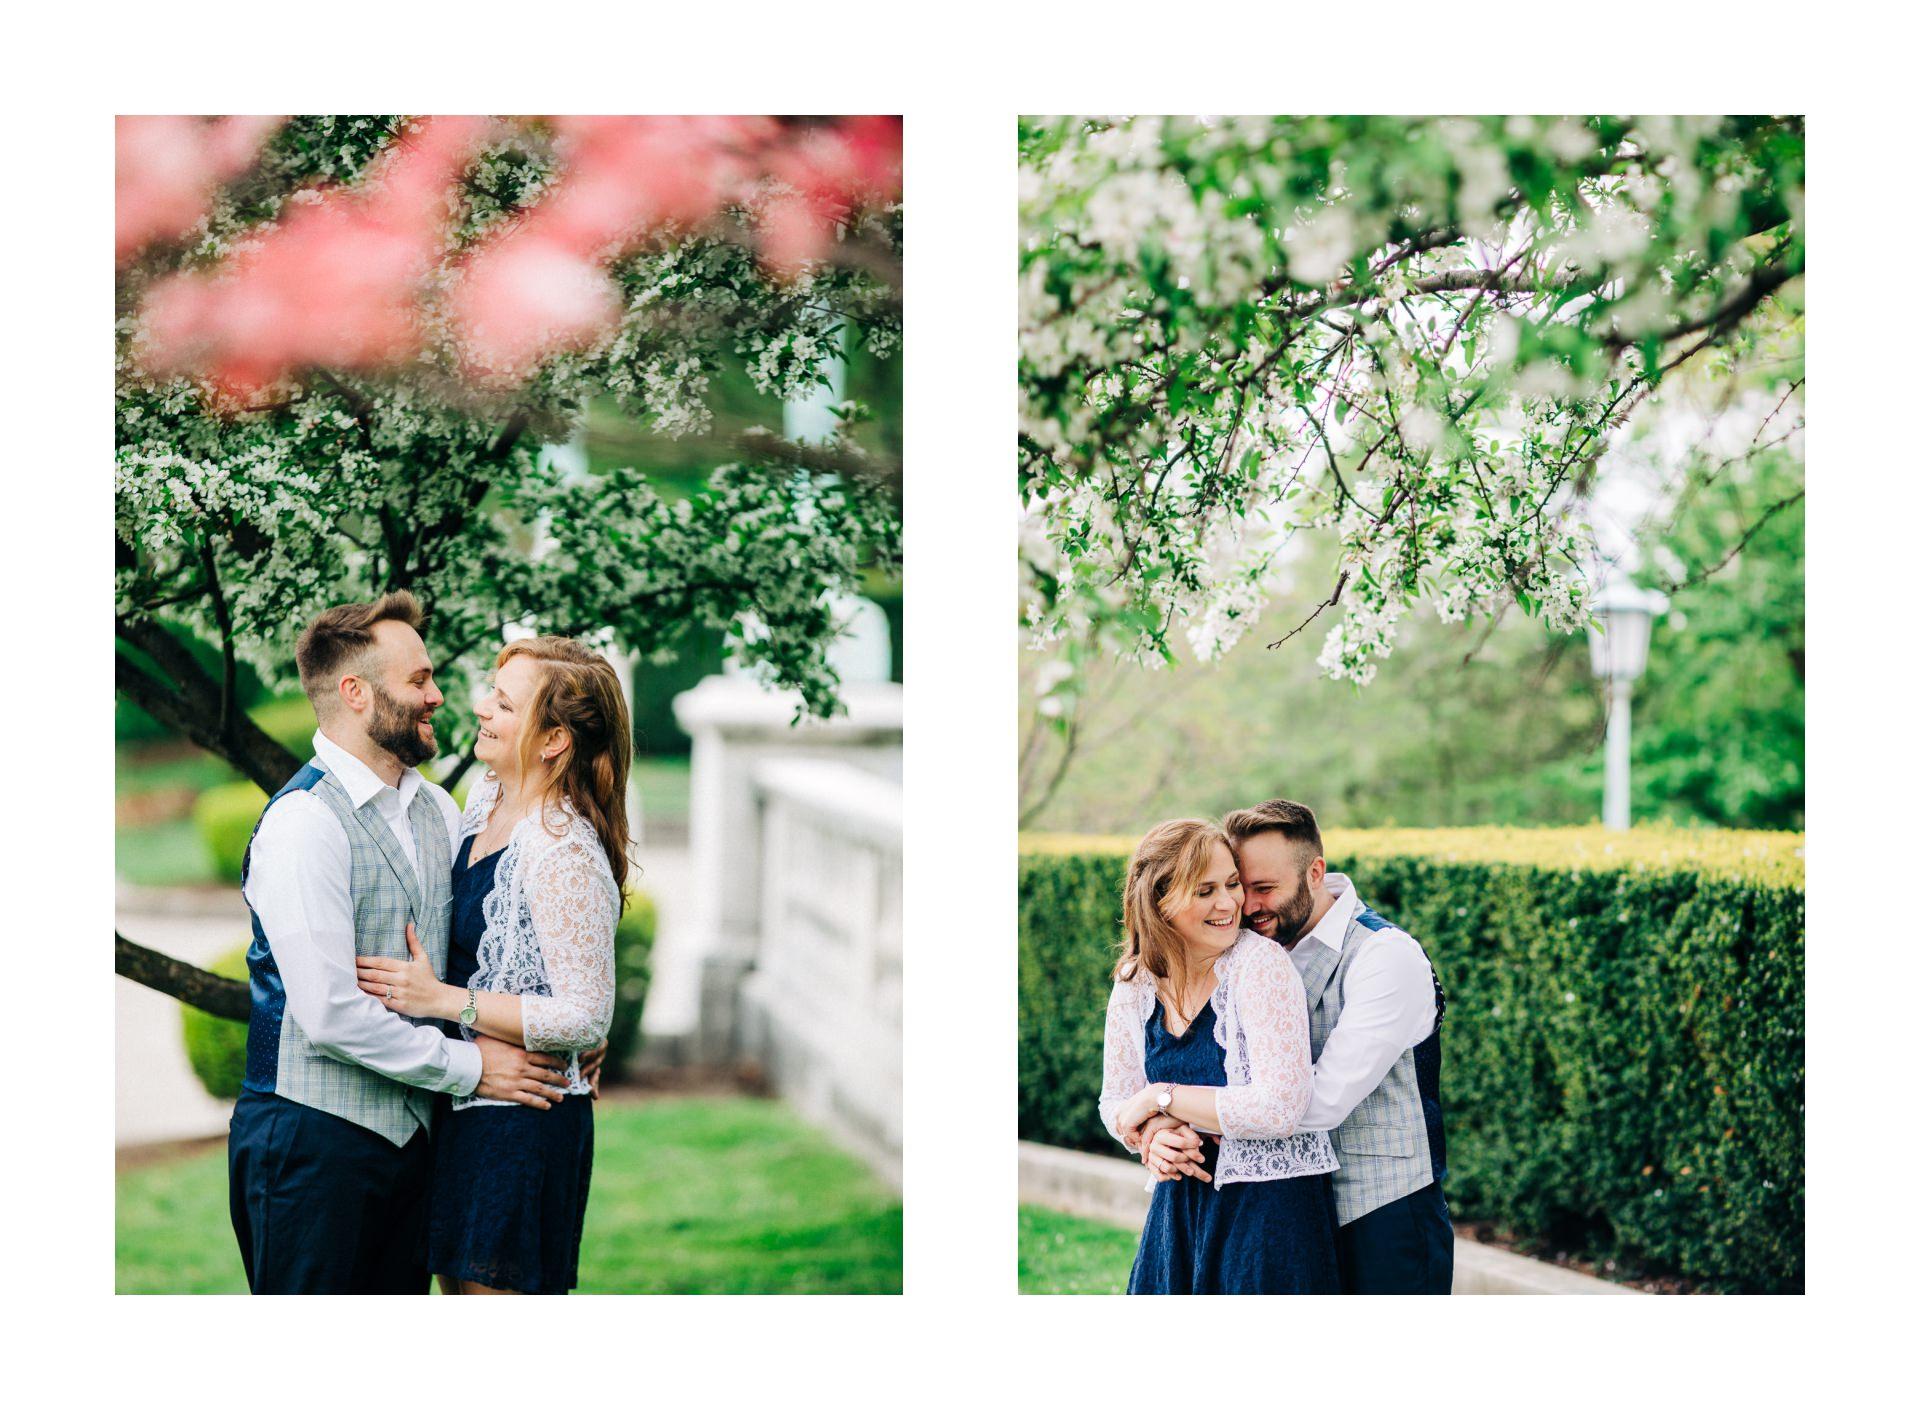 Cleveland Spring Cherry Blossom Engagement Session 7.jpg